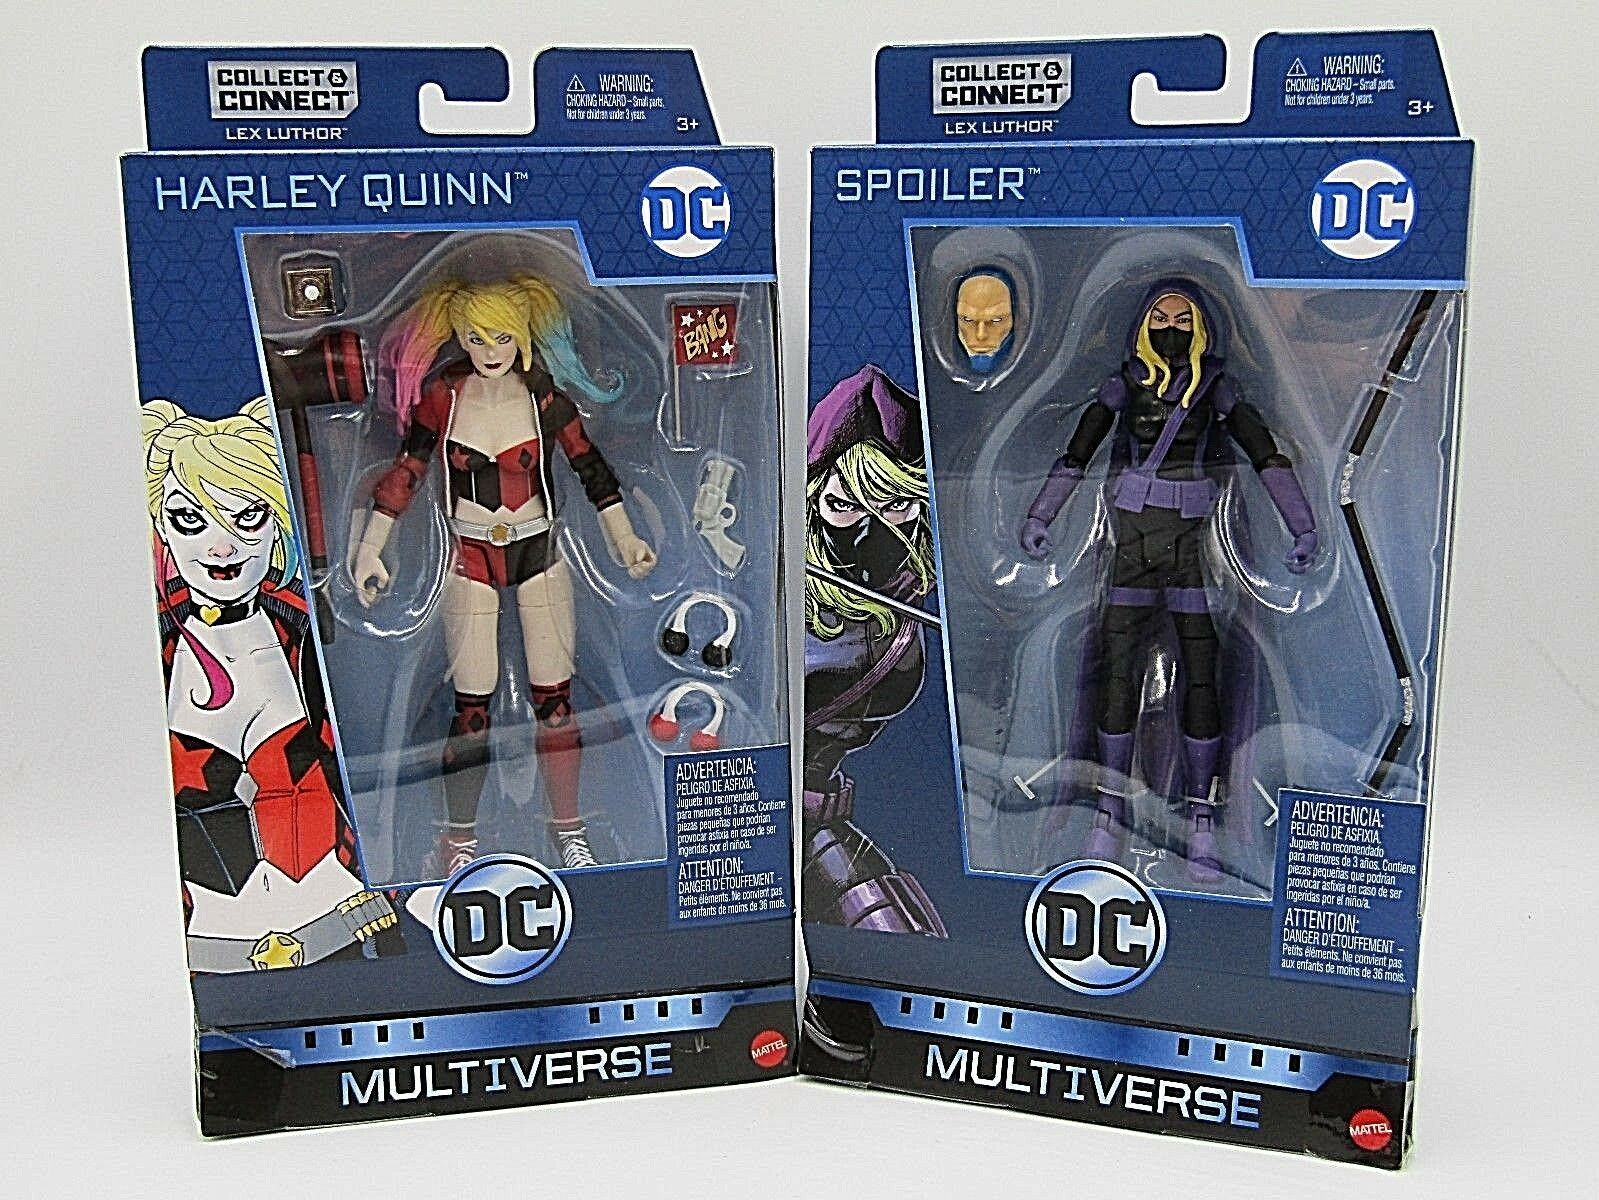 DC Multiverse Spoiler & Harley Quinn Baf Lex Detective Comics